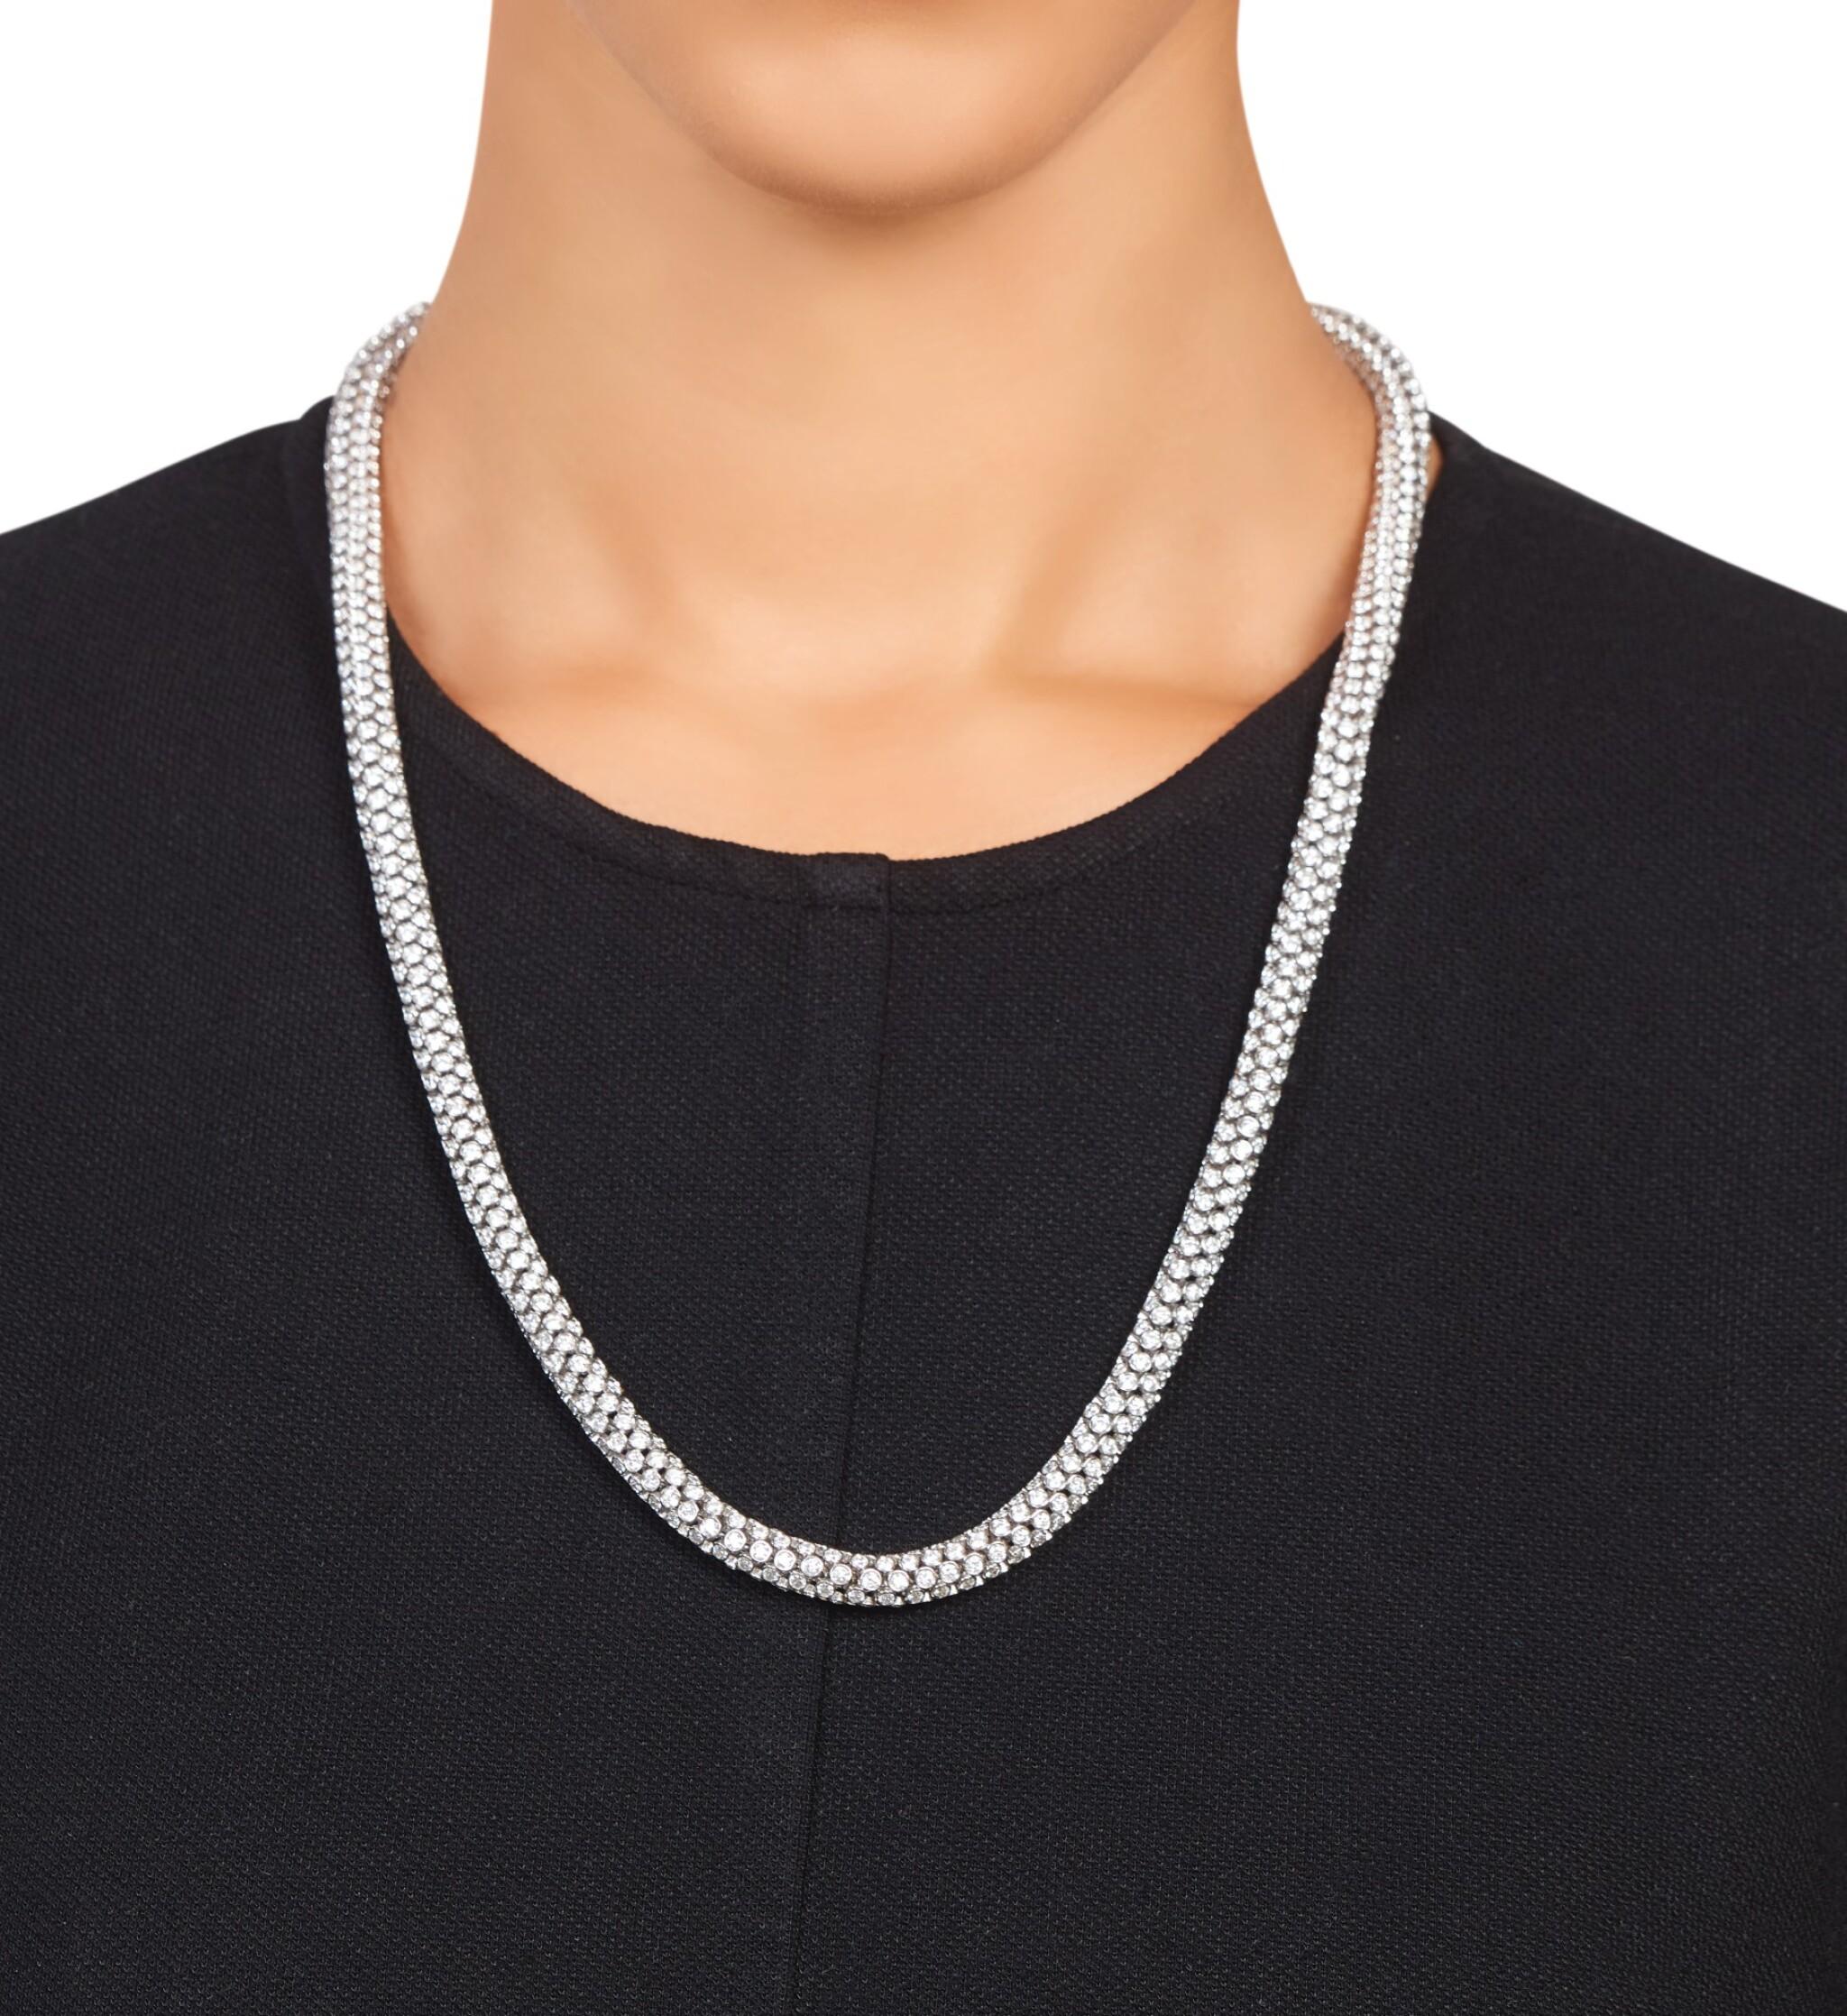 View 1 of Lot 498. Diamond Necklace-Bracelet Combination.